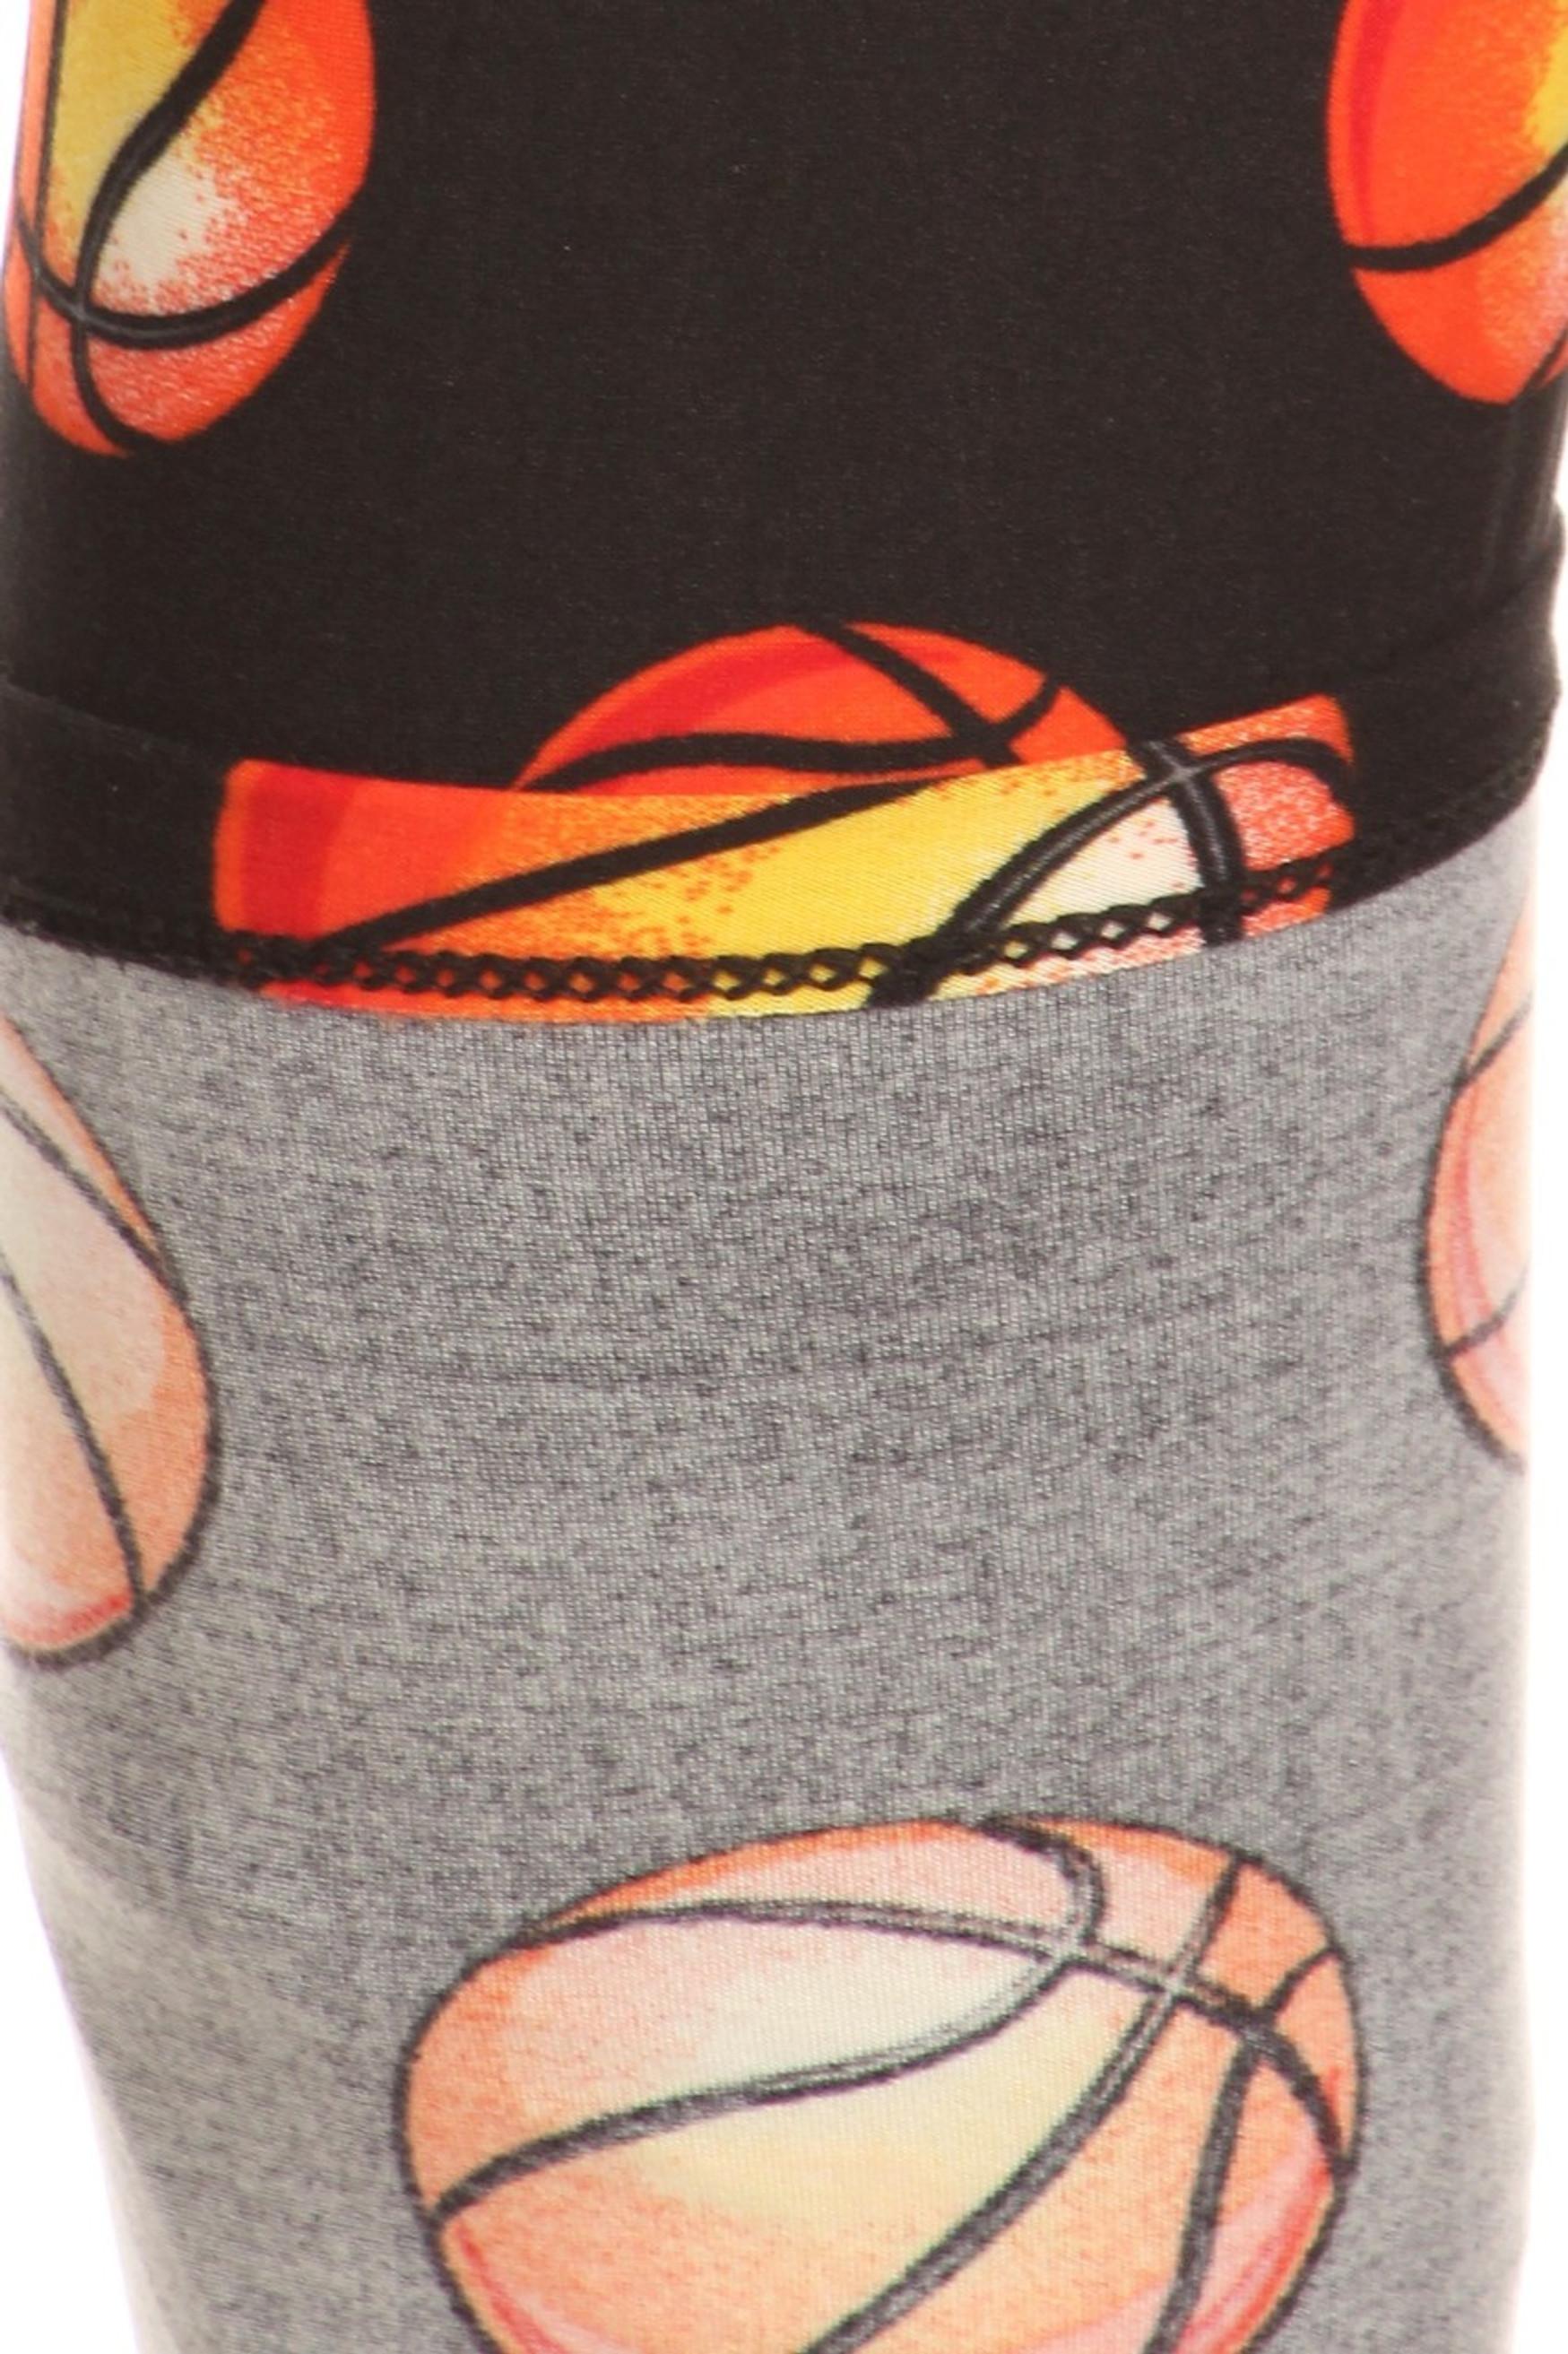 BrushedBasketball Plus Size Leggings - 3X-5X